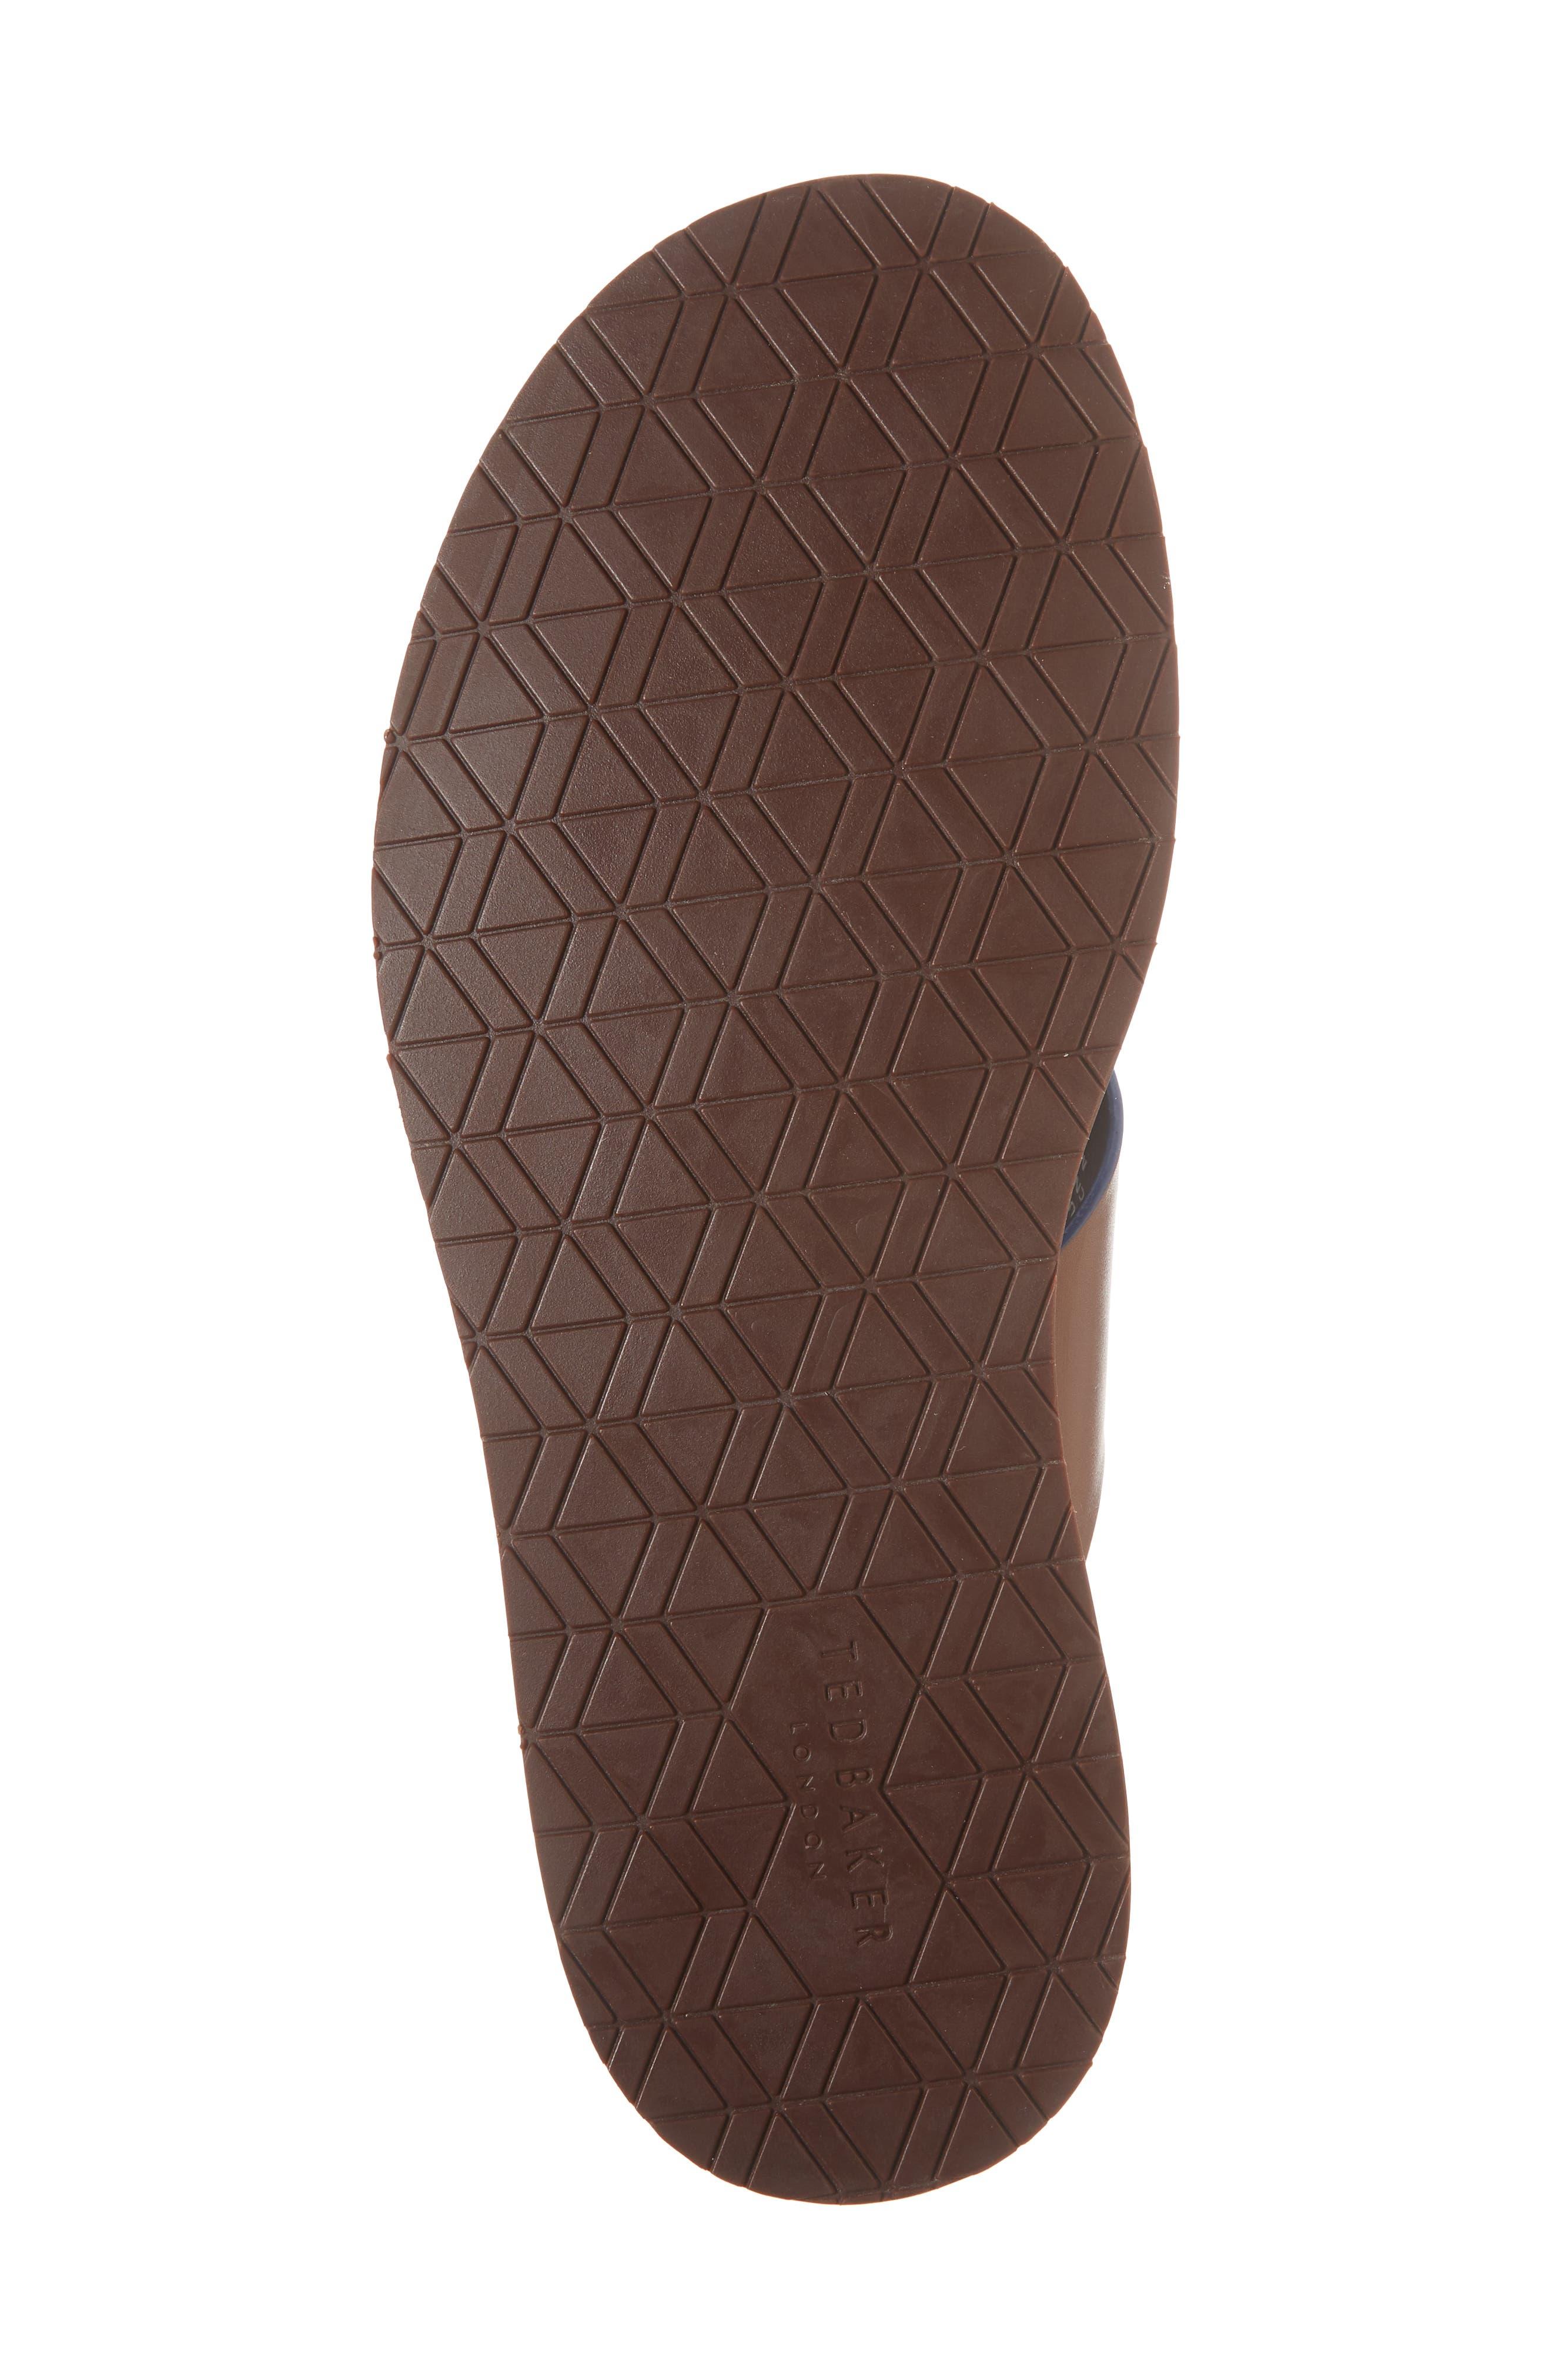 Farrull Cross Strap Slide Sandal,                             Alternate thumbnail 6, color,                             Tan Leather/ Textile